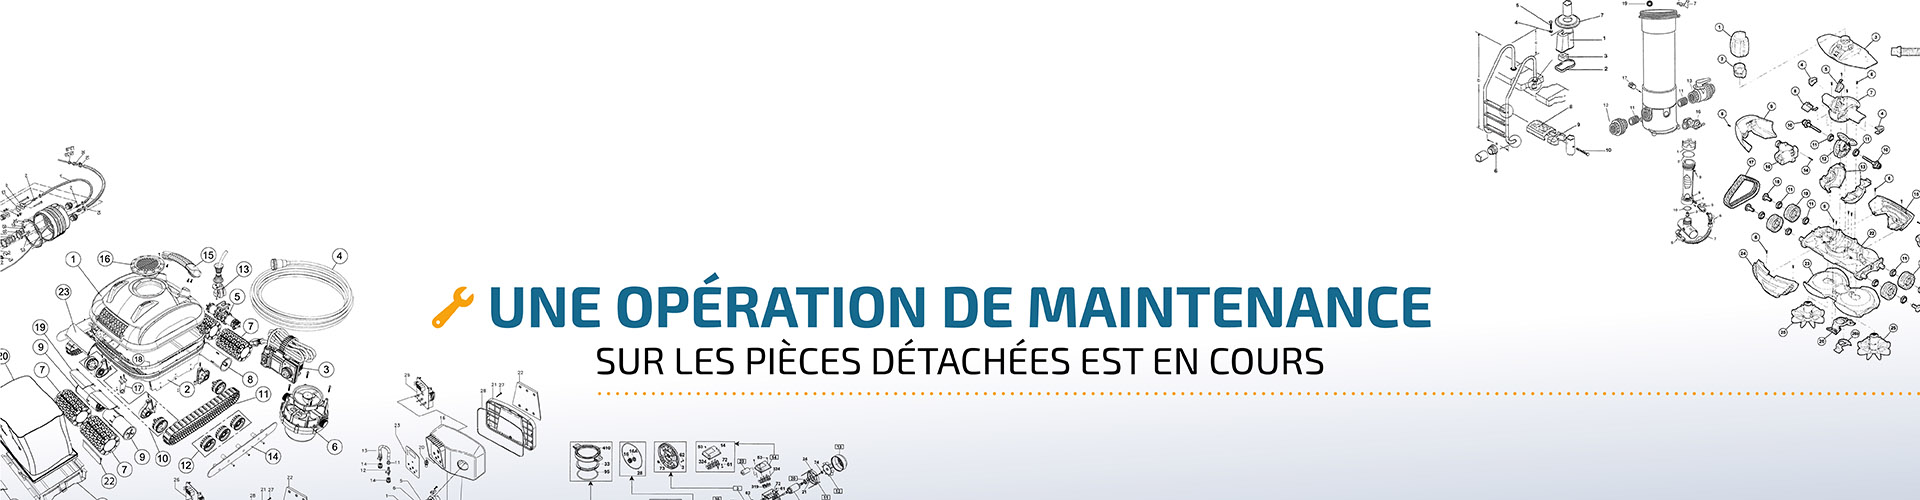 slide_operation_maintenance.jpg